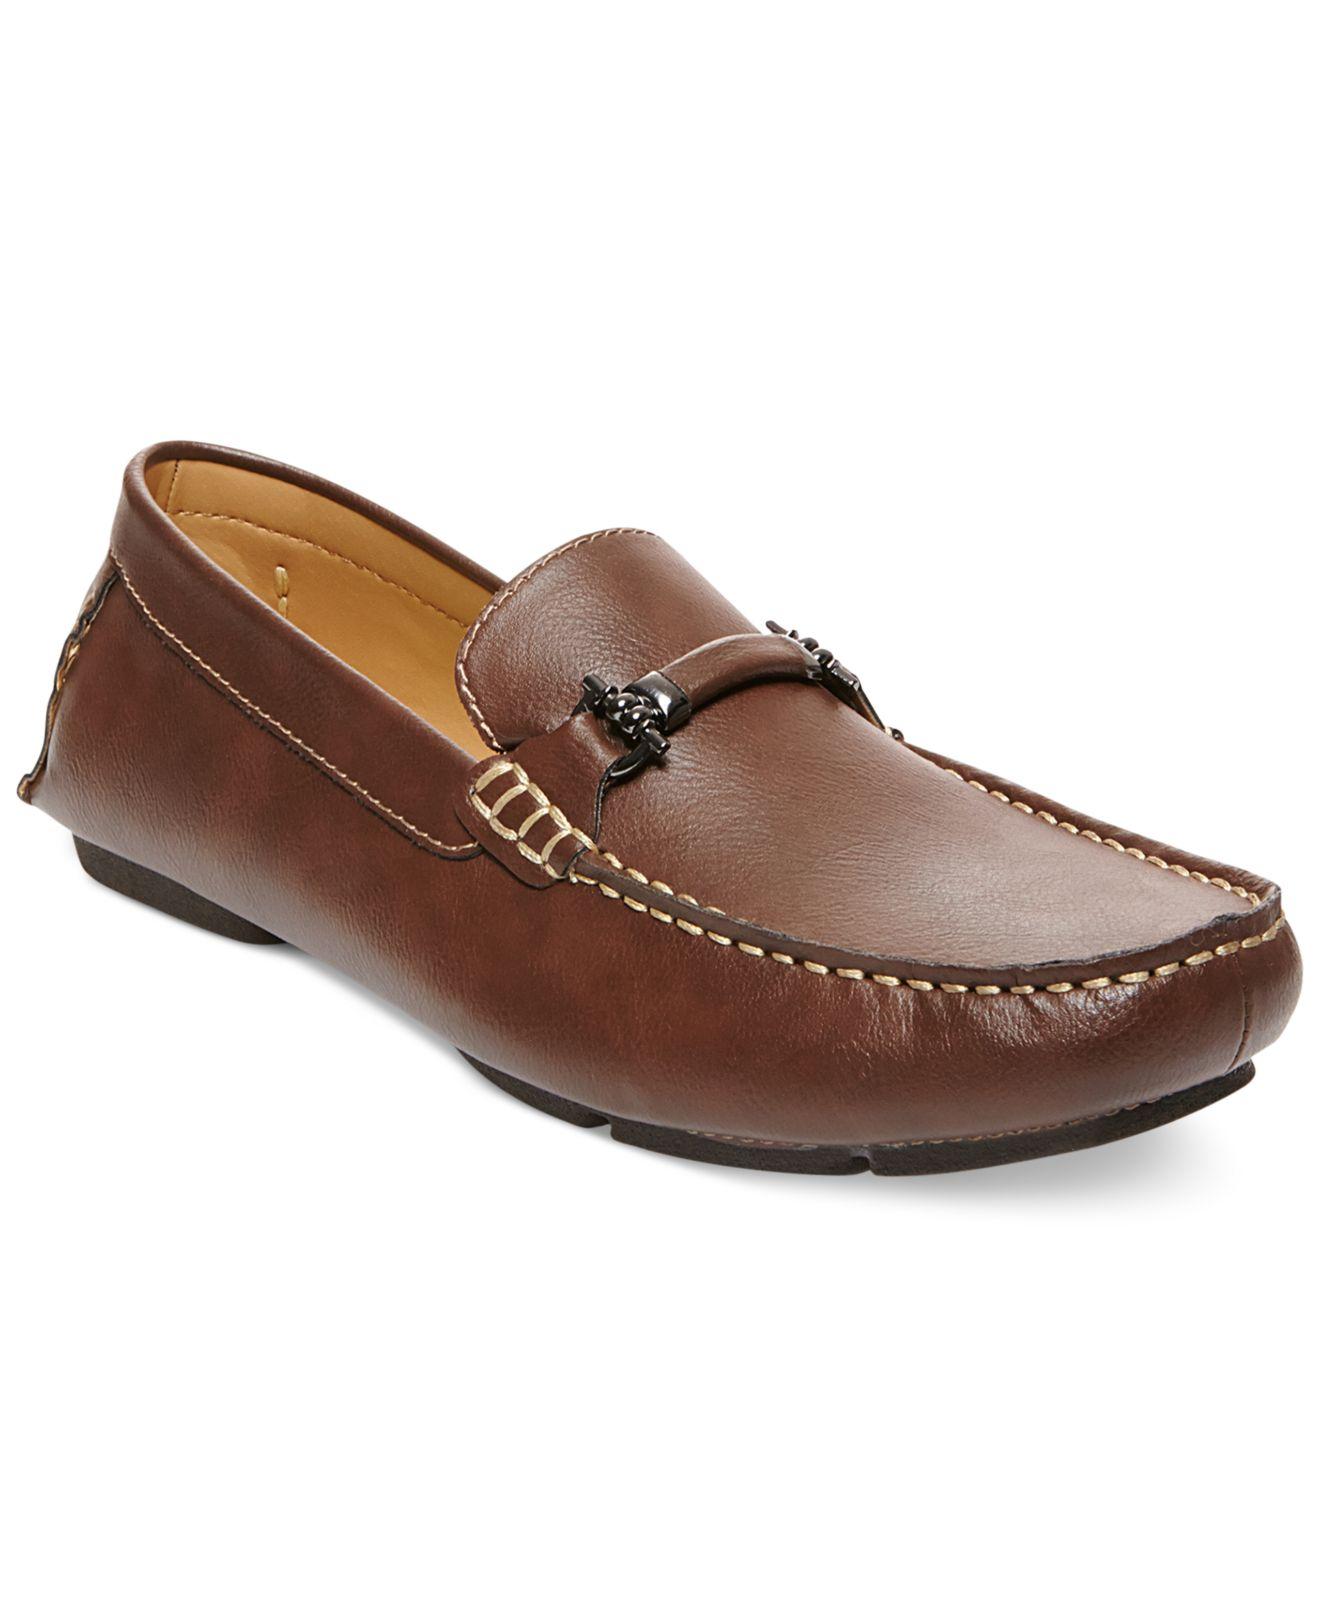 Steve madden Madden Trulow Loafers in Brown for Men